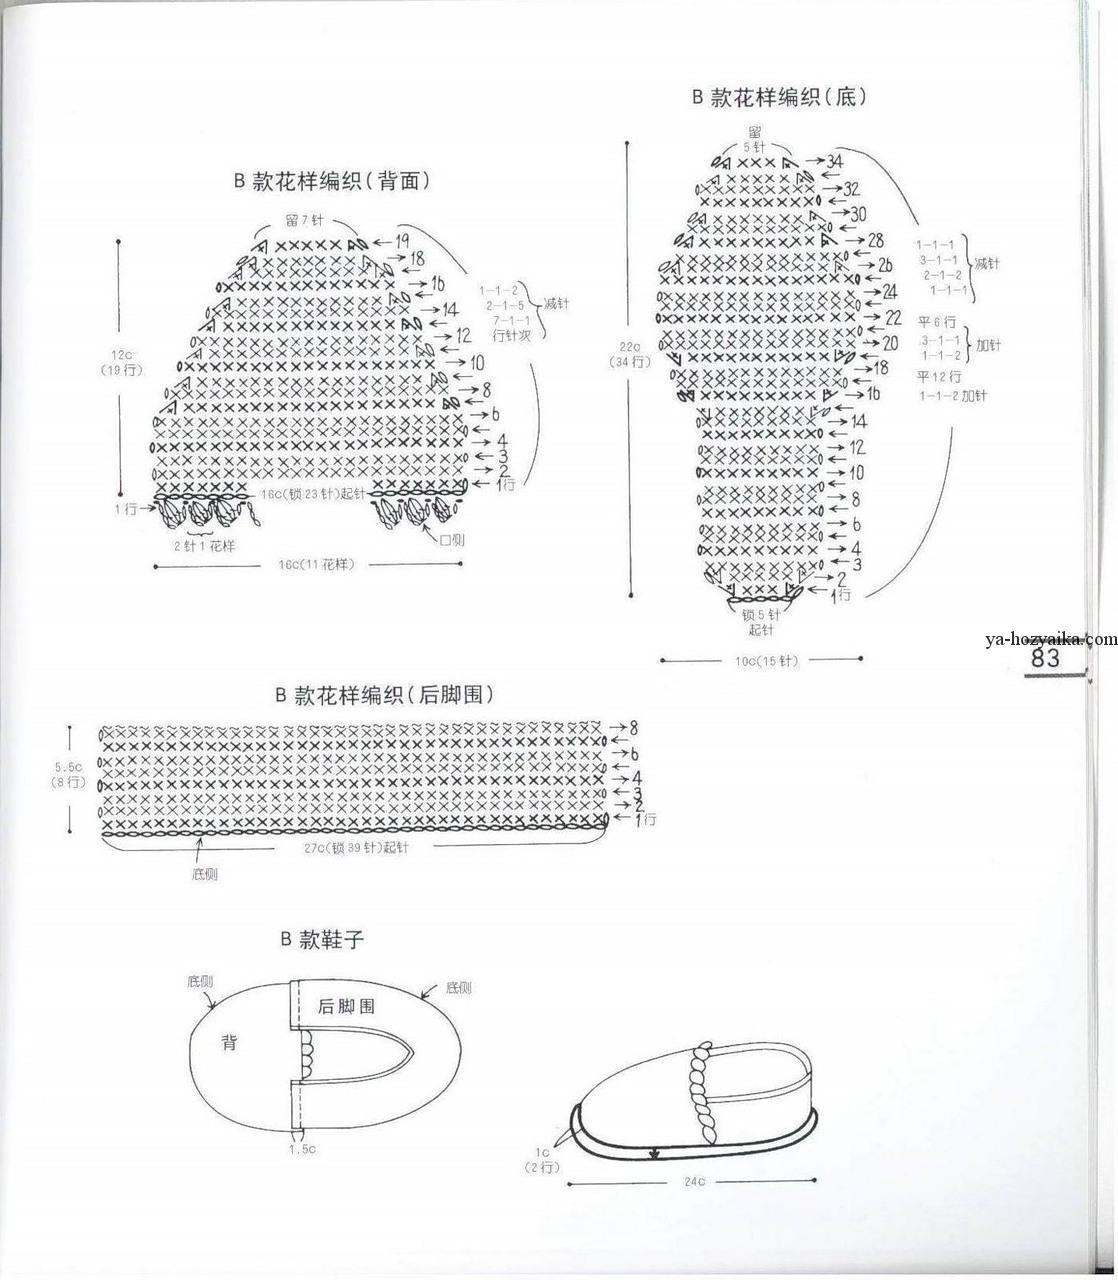 Мужские тапочки крючком схема фото 559